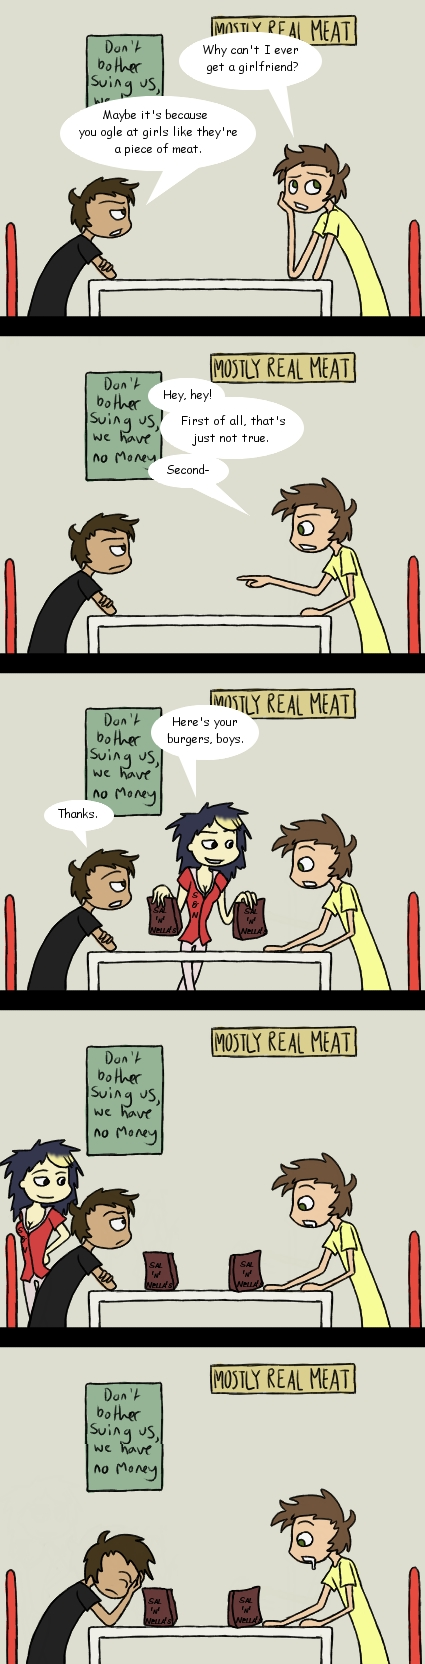 0027: Tasty Meat